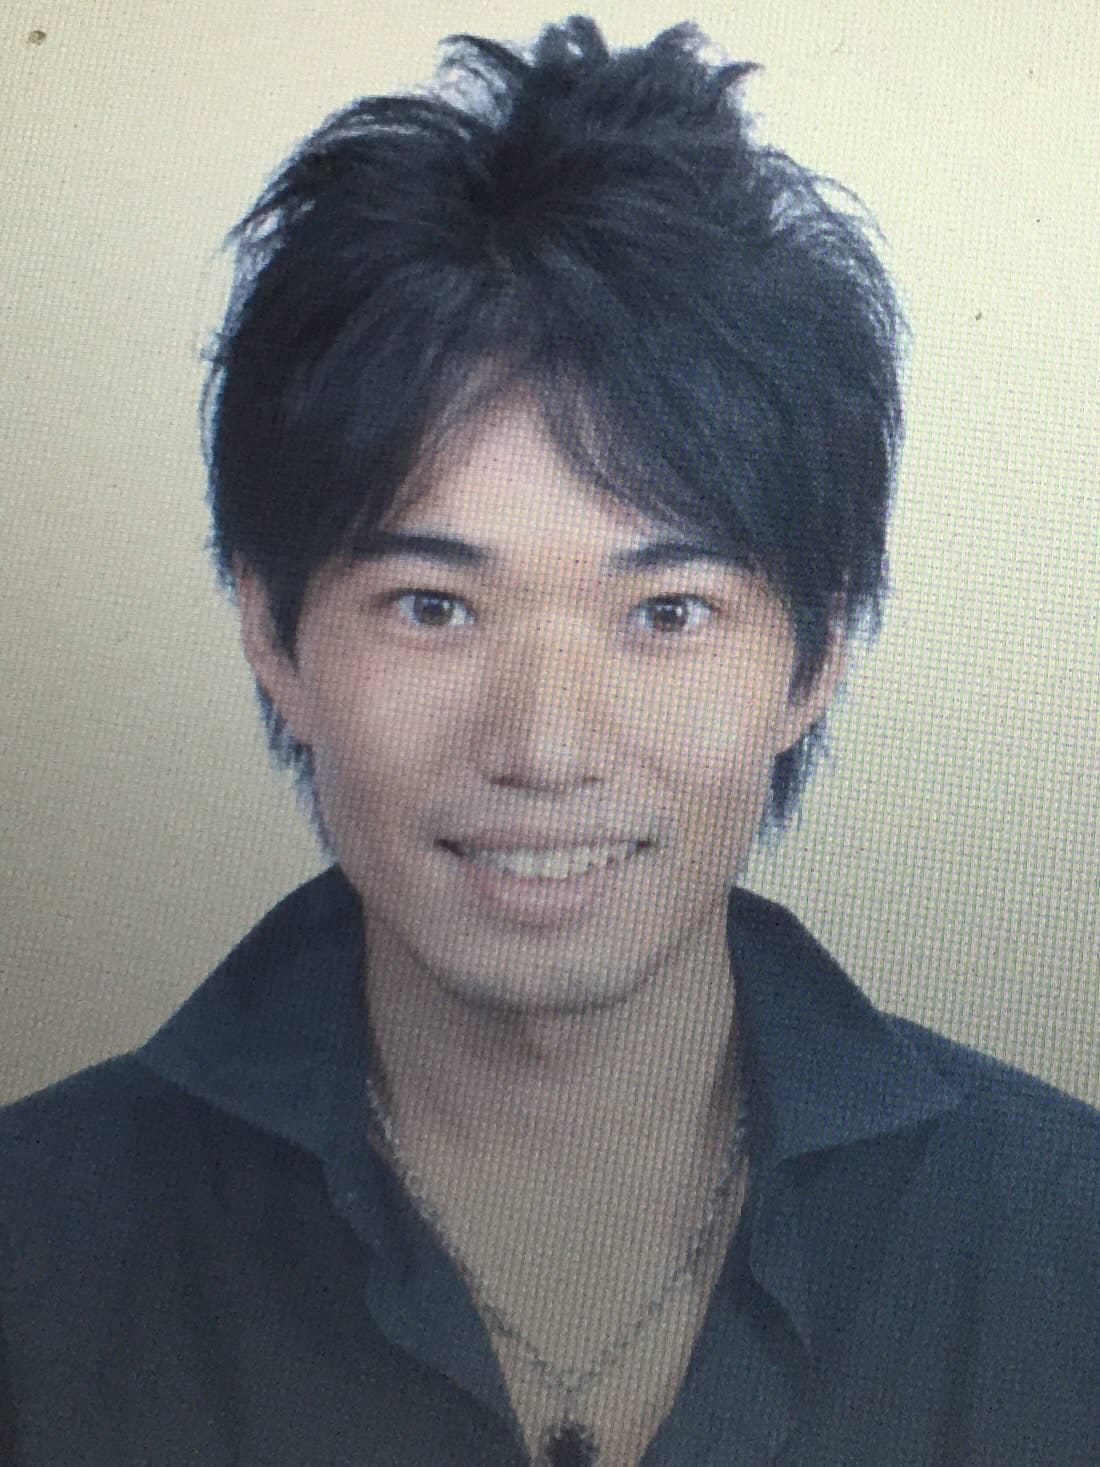 Koji Nakayama